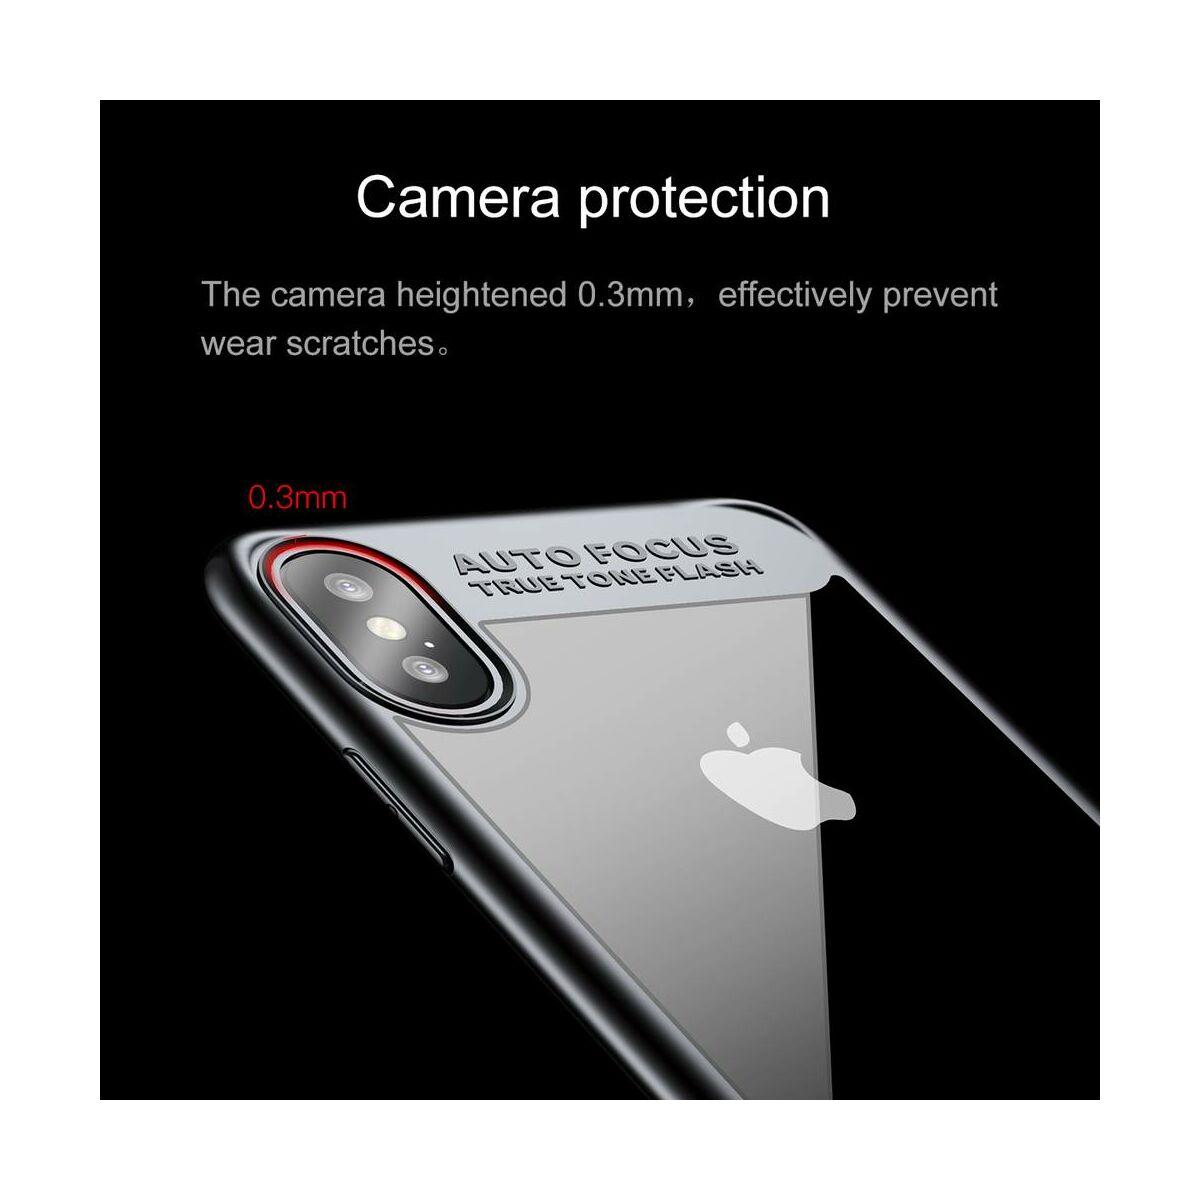 Baseus iPhone X/XS tok, Suthin, Thin, fekete (ARAPIPHX-SB01)